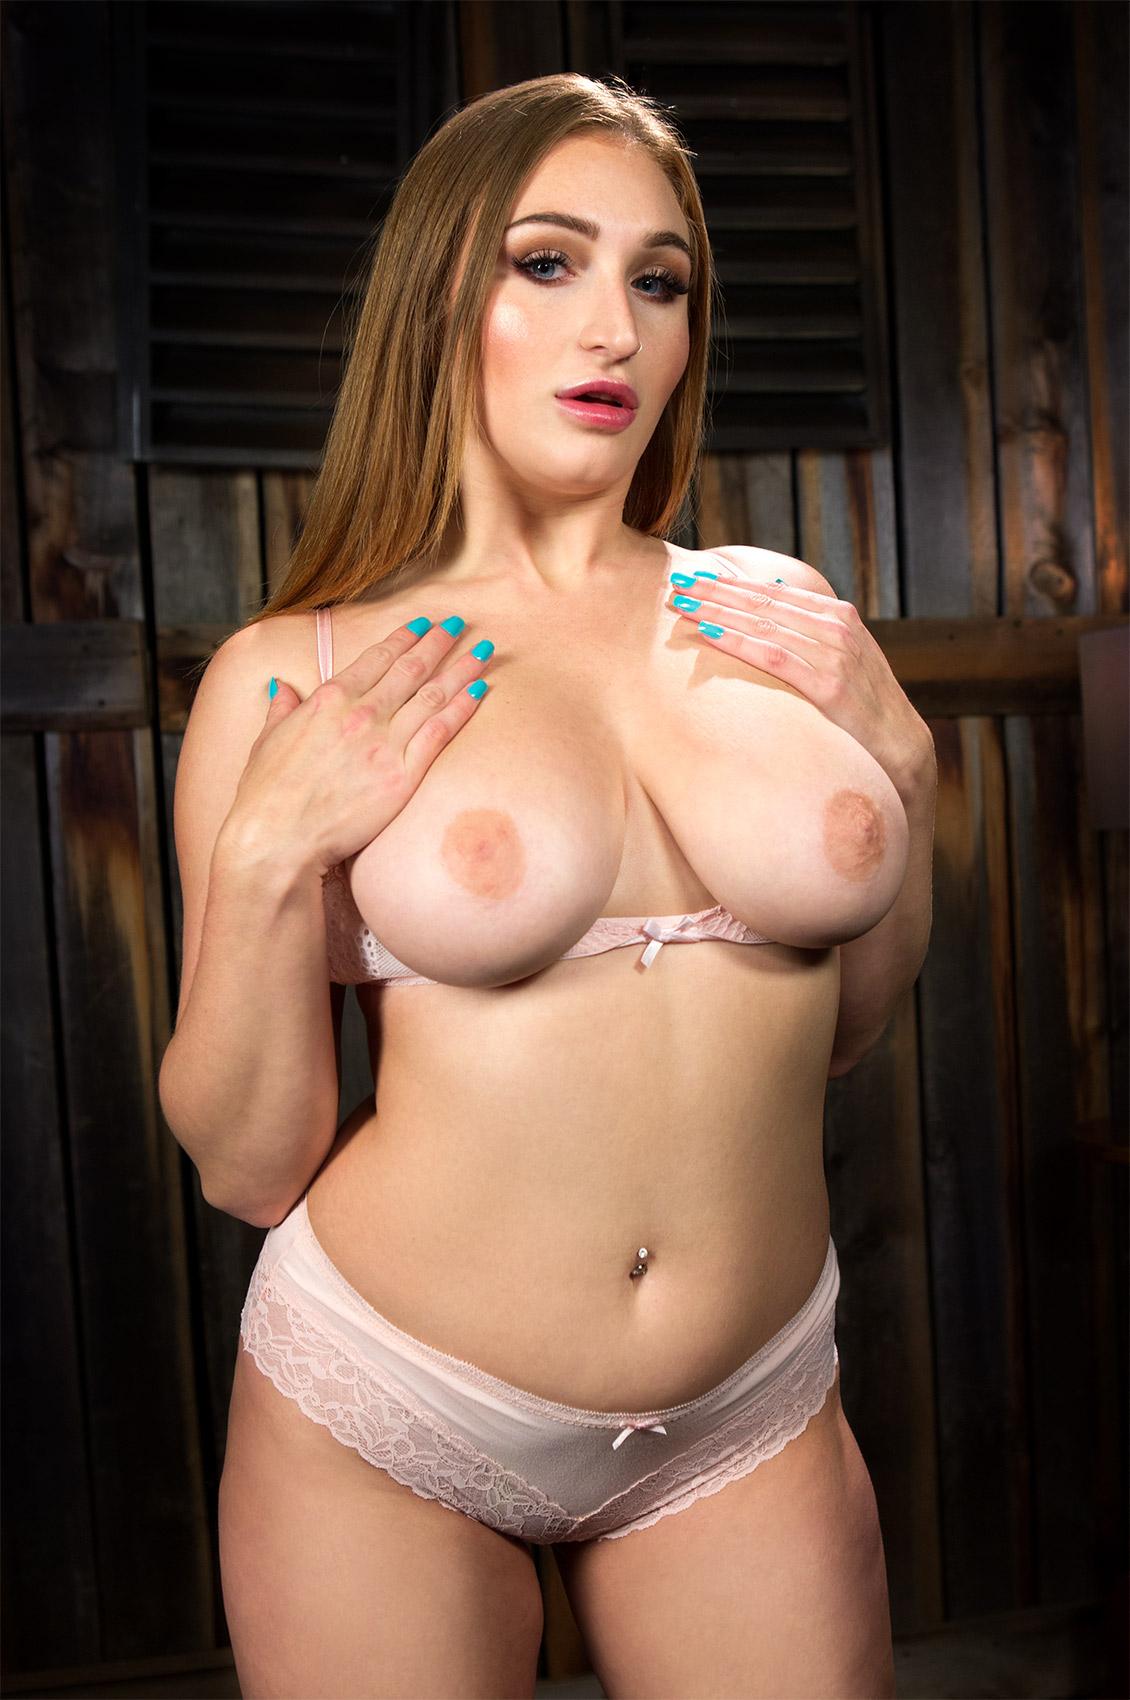 Skylar Snow's VR Porn Videos, Bio & Free Nude Pics